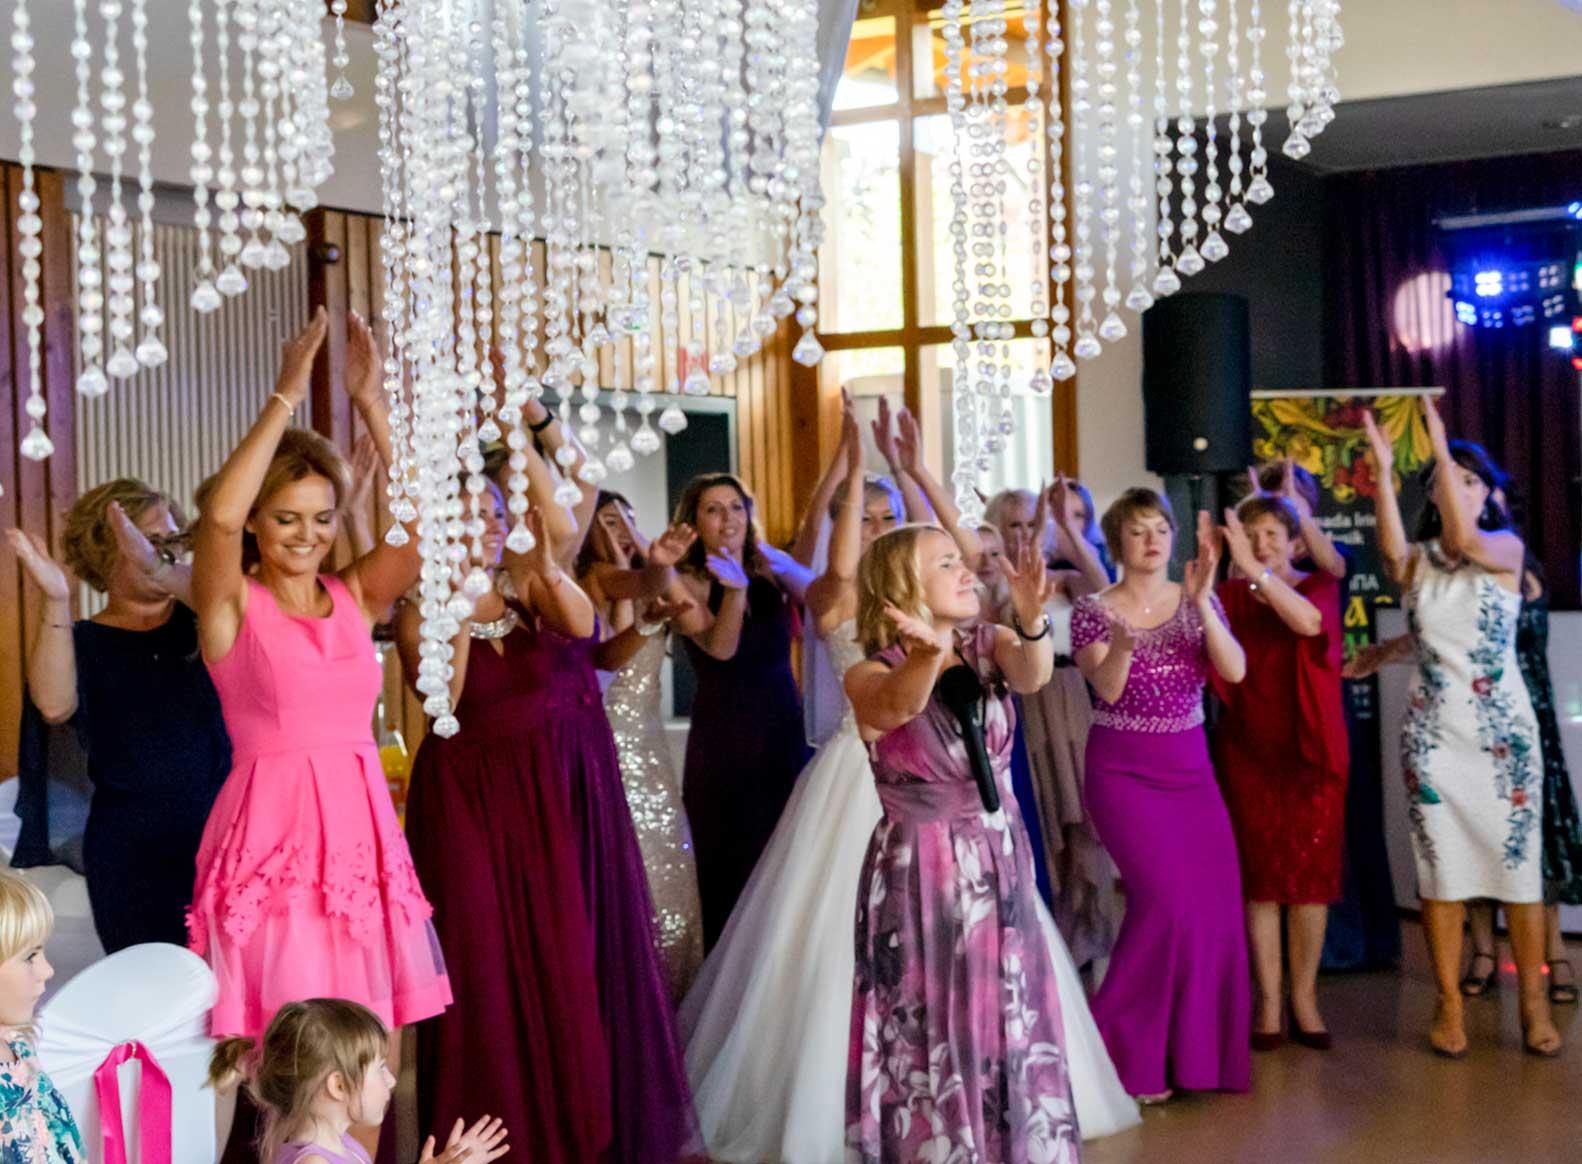 Hochzeitsmoderation Thema: Fifty shades of luck